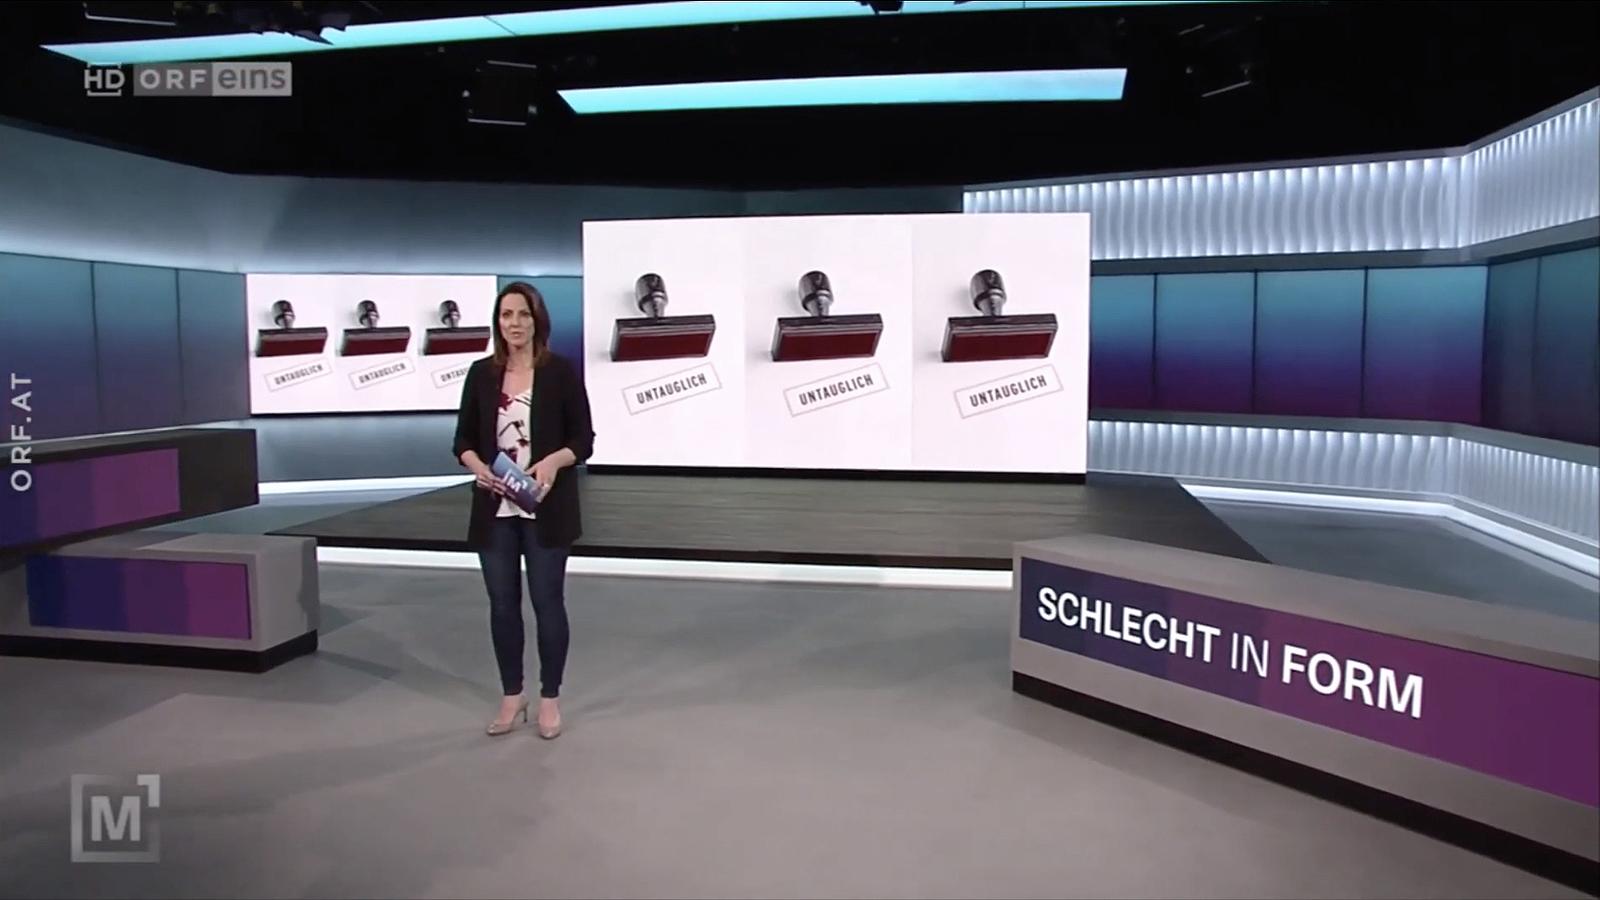 NCS_ORF-Veech-2019_0010